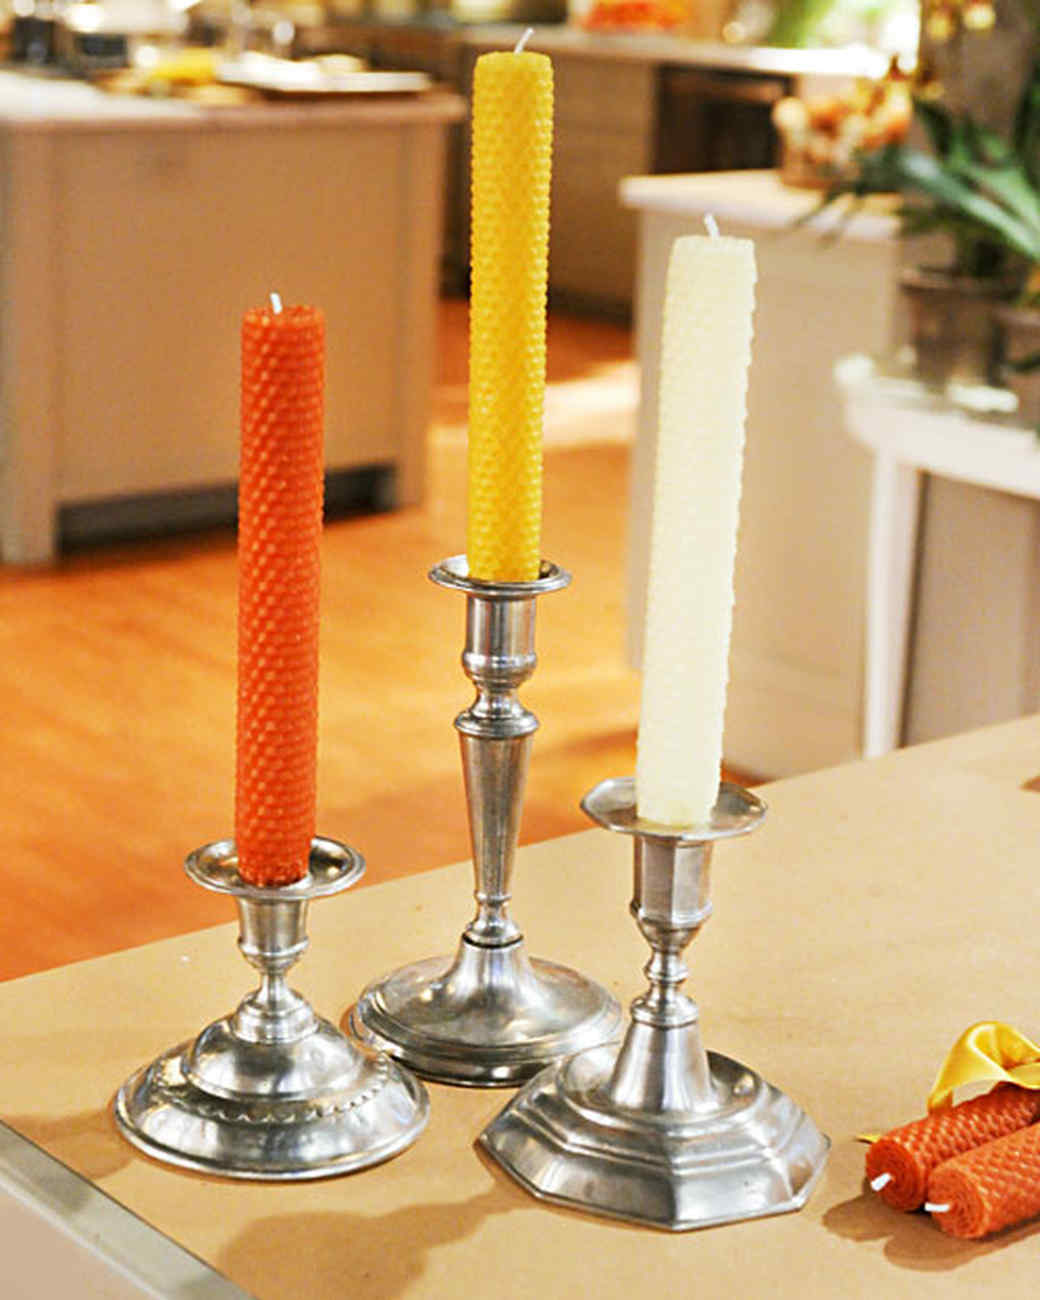 6041_110910_candles.jpg